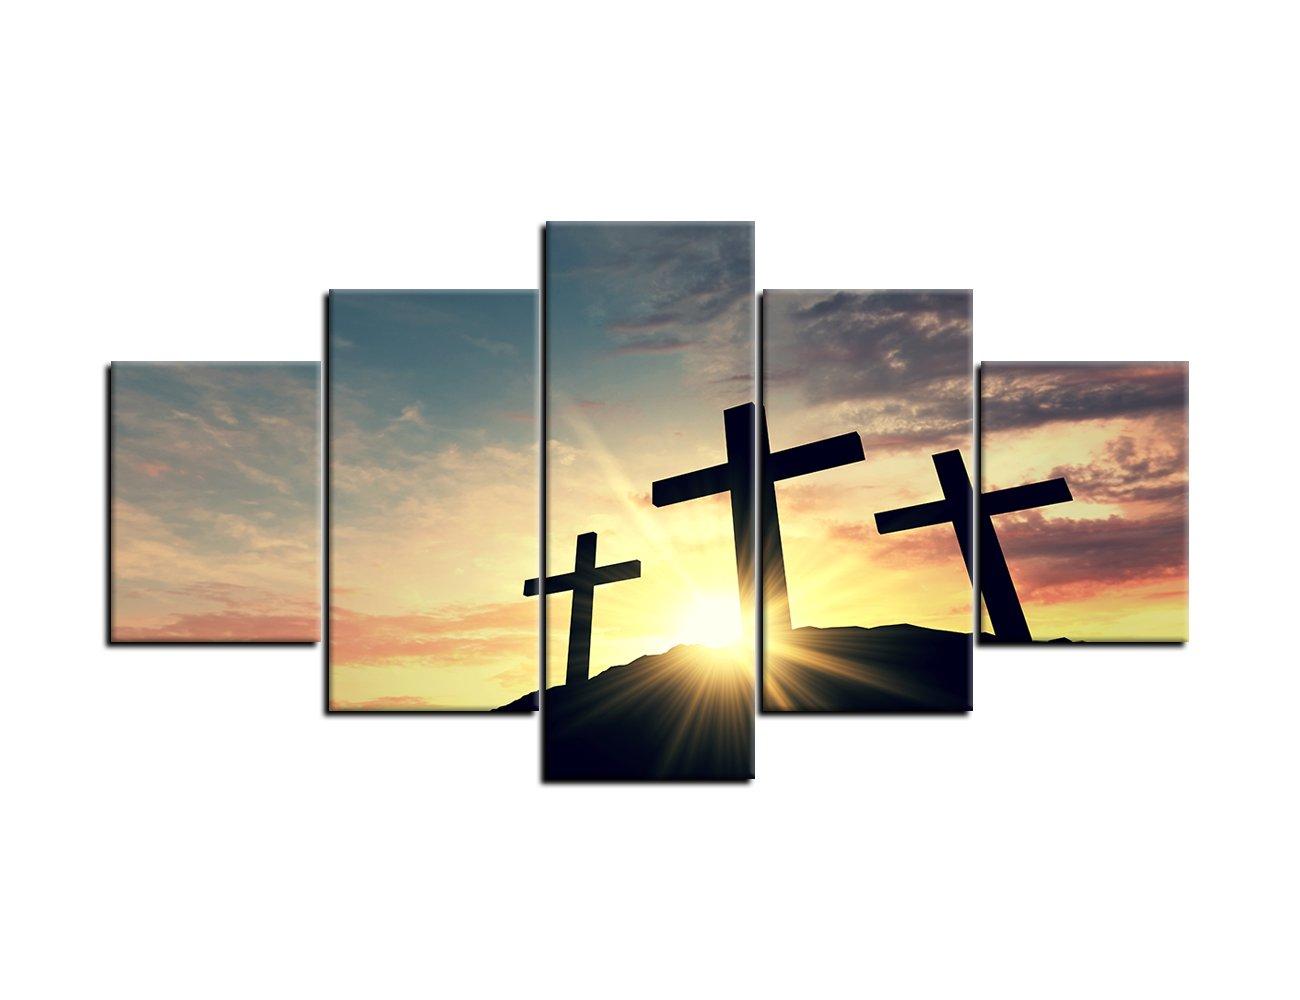 Amazon.com: Christian Cross Wall Art Canvas Painting Print Poster 5 ...